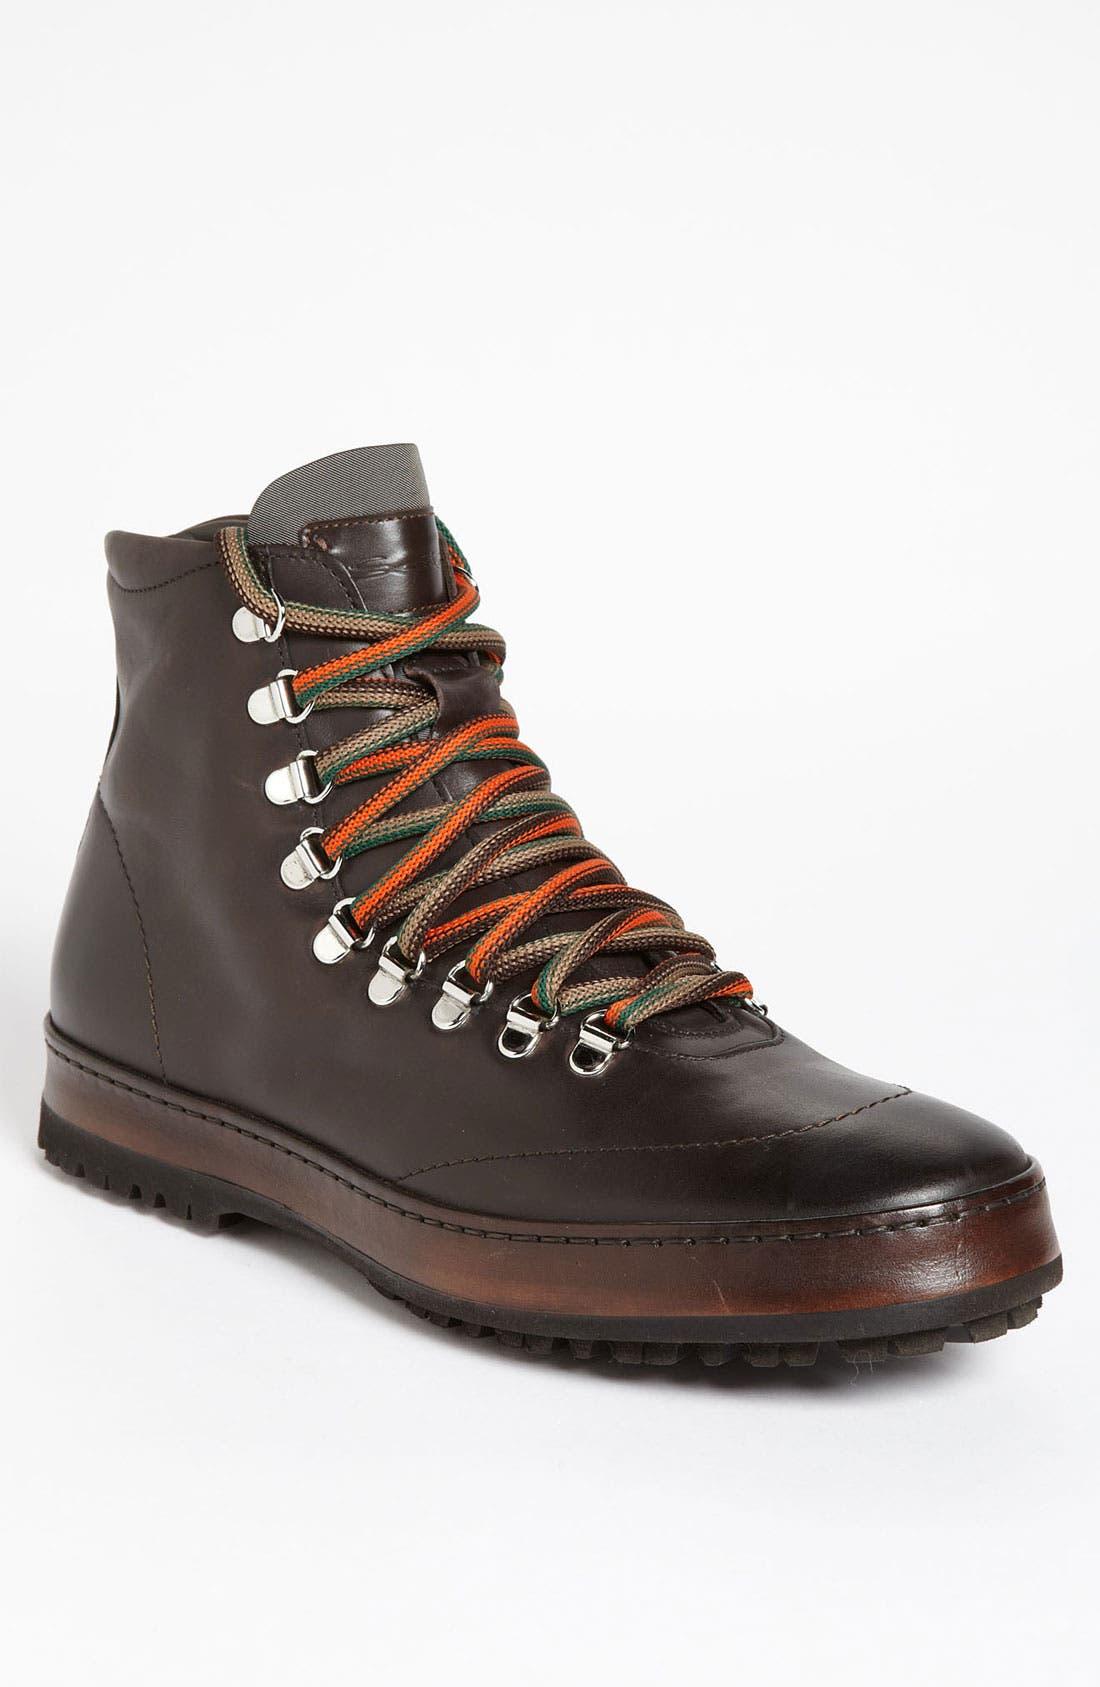 Alternate Image 1 Selected - Santoni 'Cool City' Boot